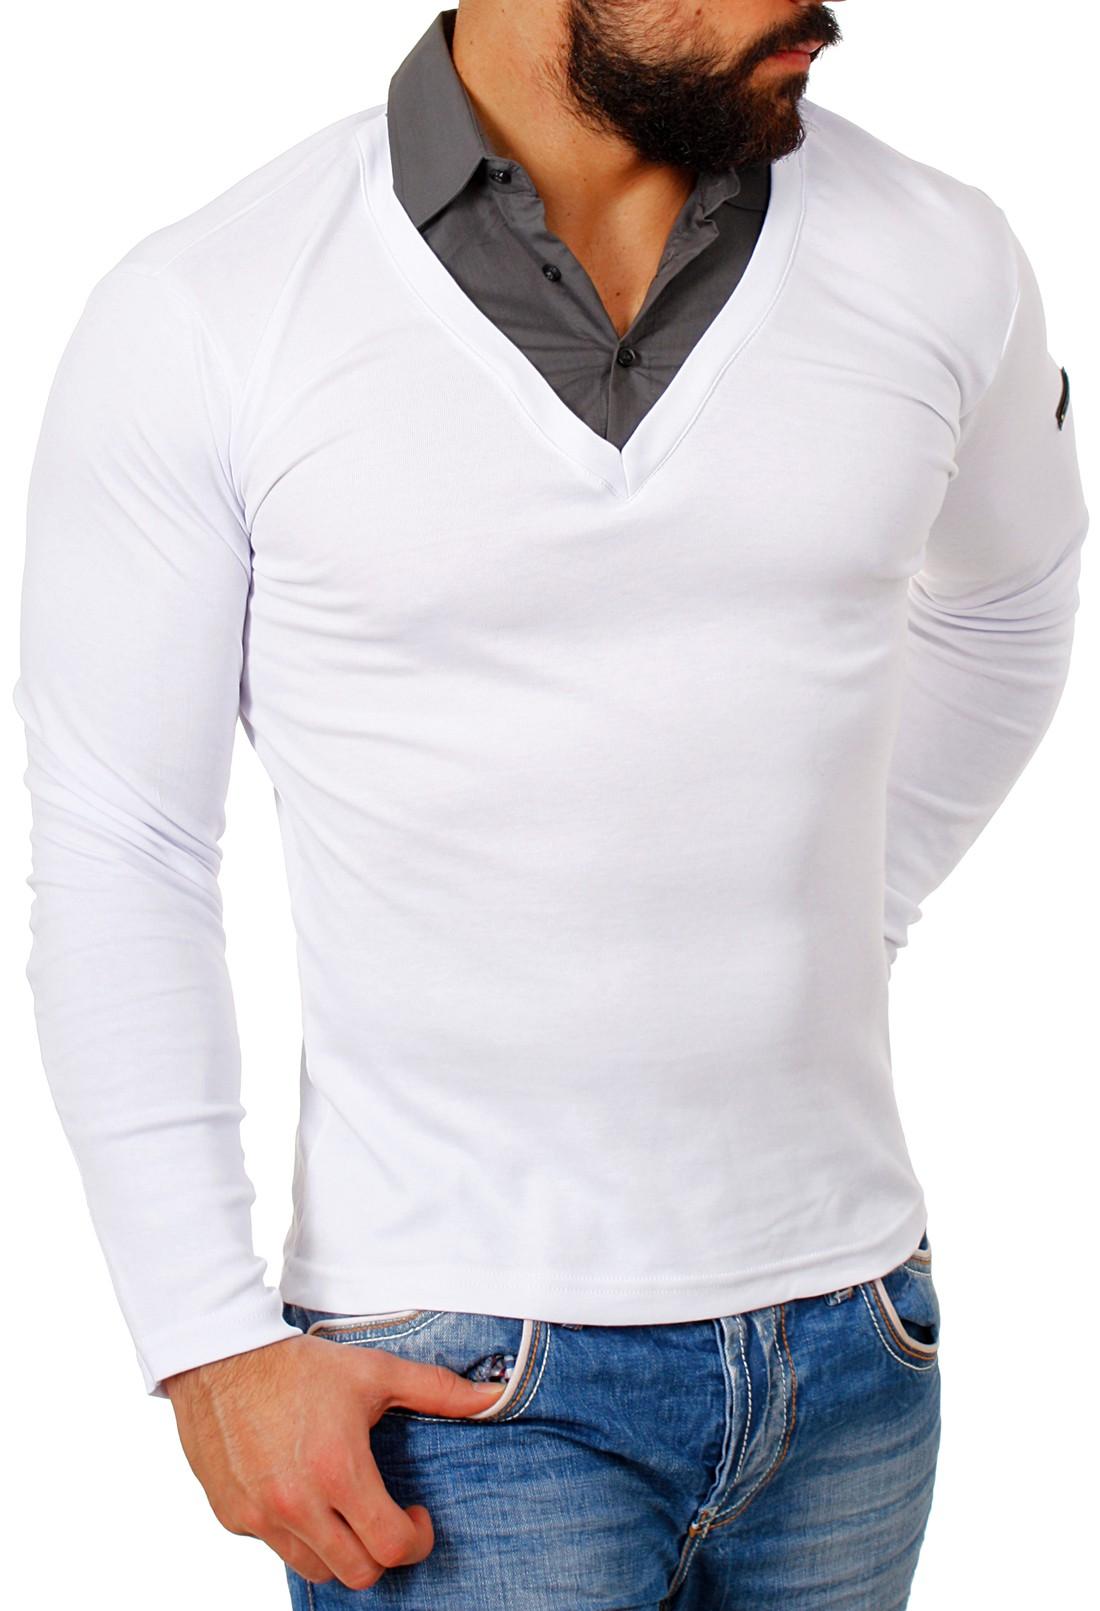 rerock herren double look longsleeve hemd shirt pullover slimfit 2in1 optik ebay. Black Bedroom Furniture Sets. Home Design Ideas